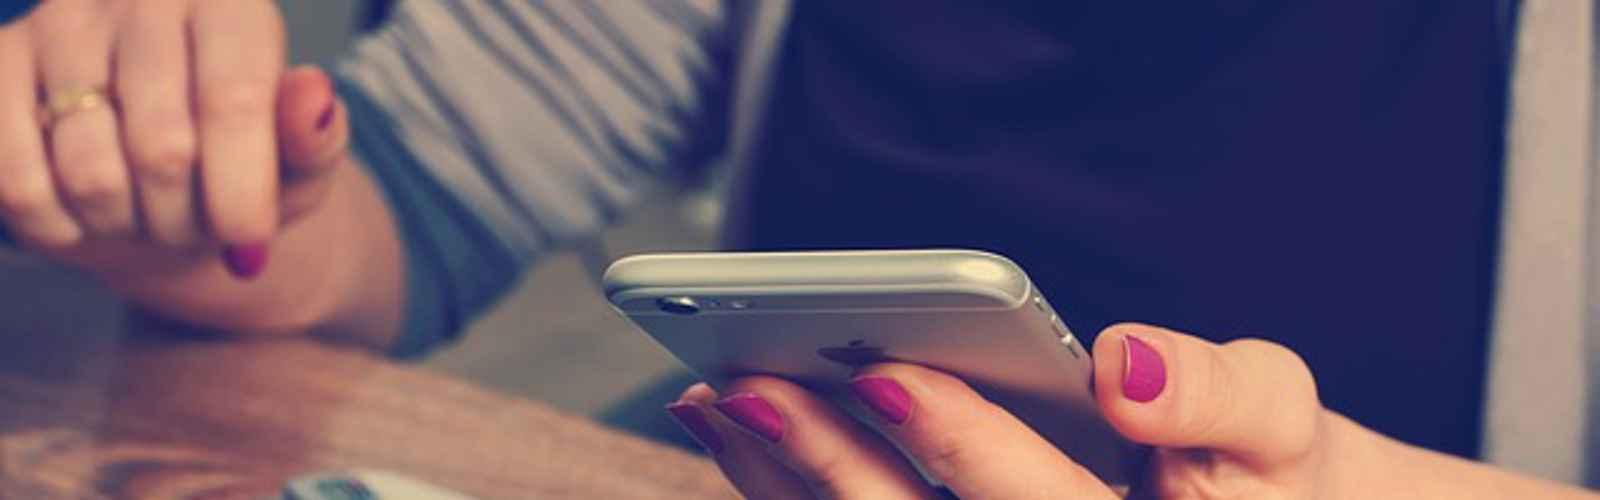 Business Phone Setups: IP Phones, Mobile Phones, or Both?